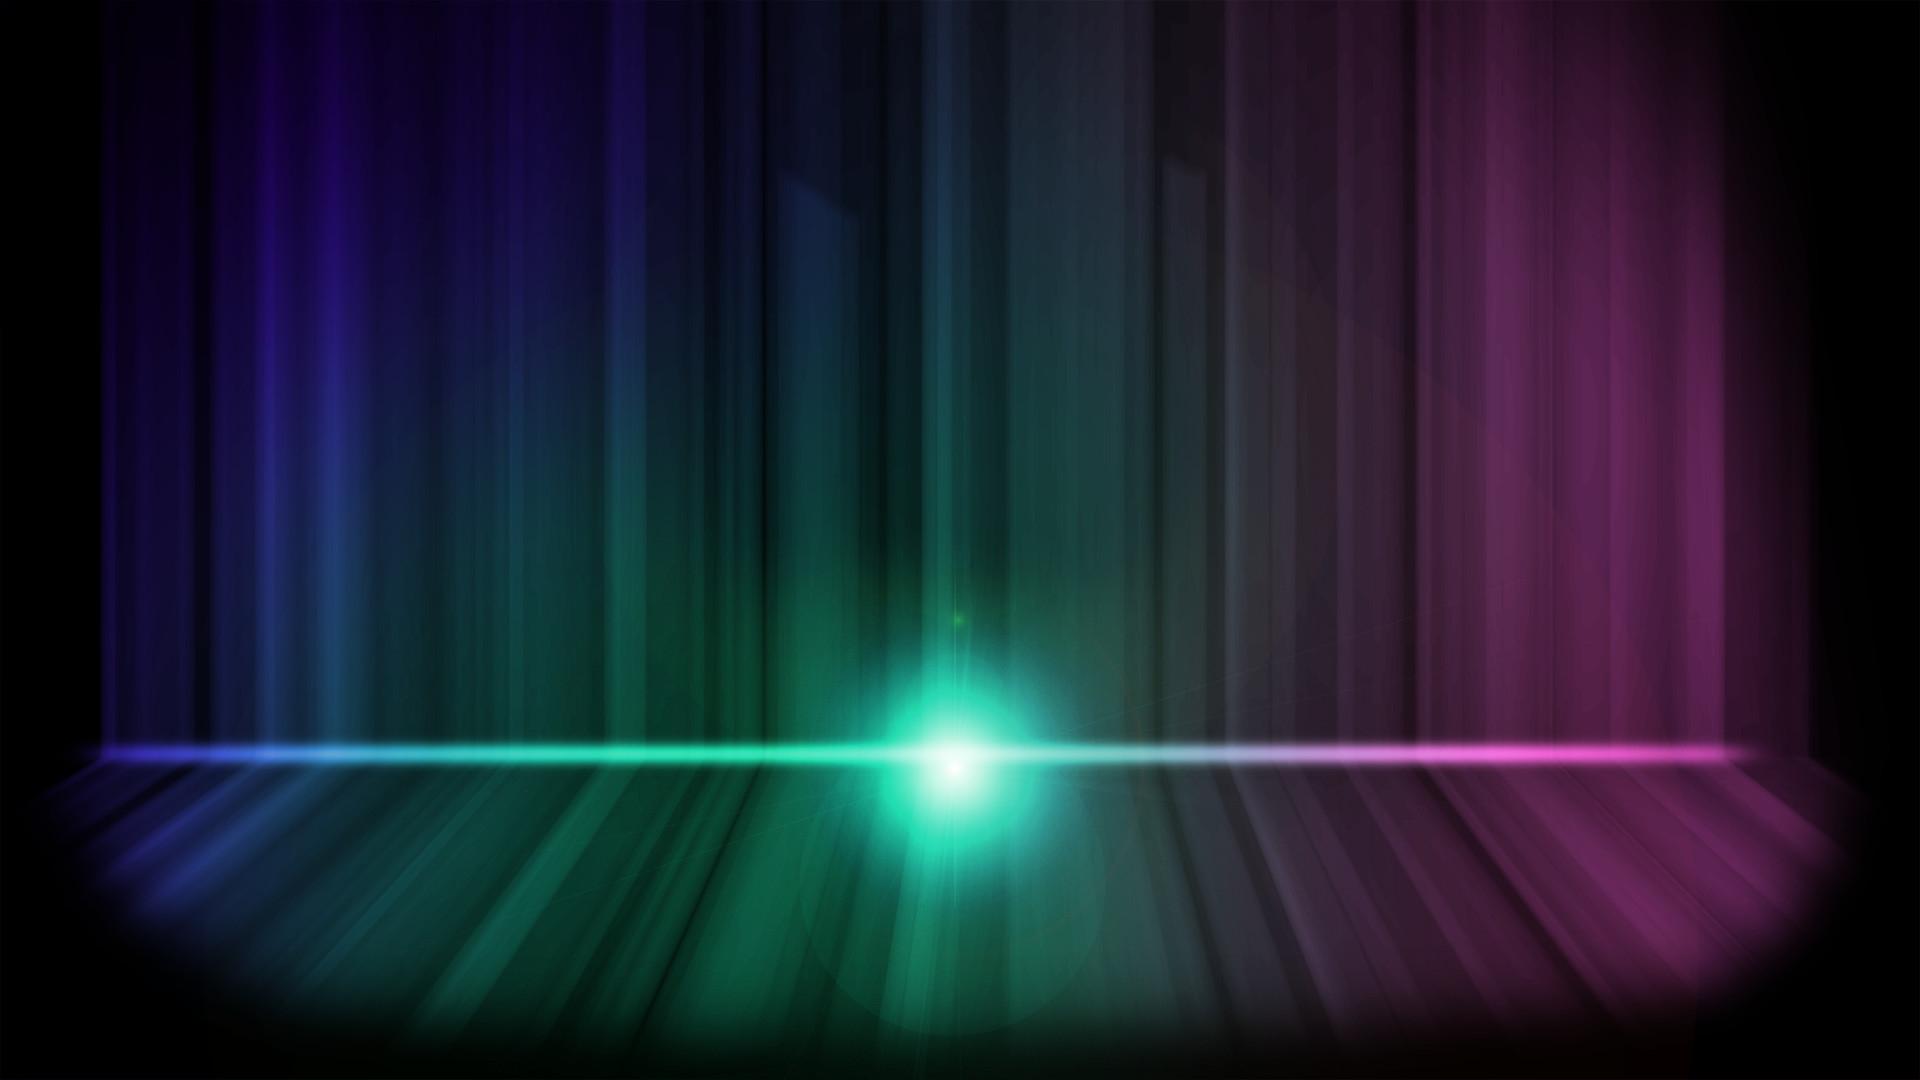 … Blue/green/pink Aurora wallpaper by Toreshii-Chann